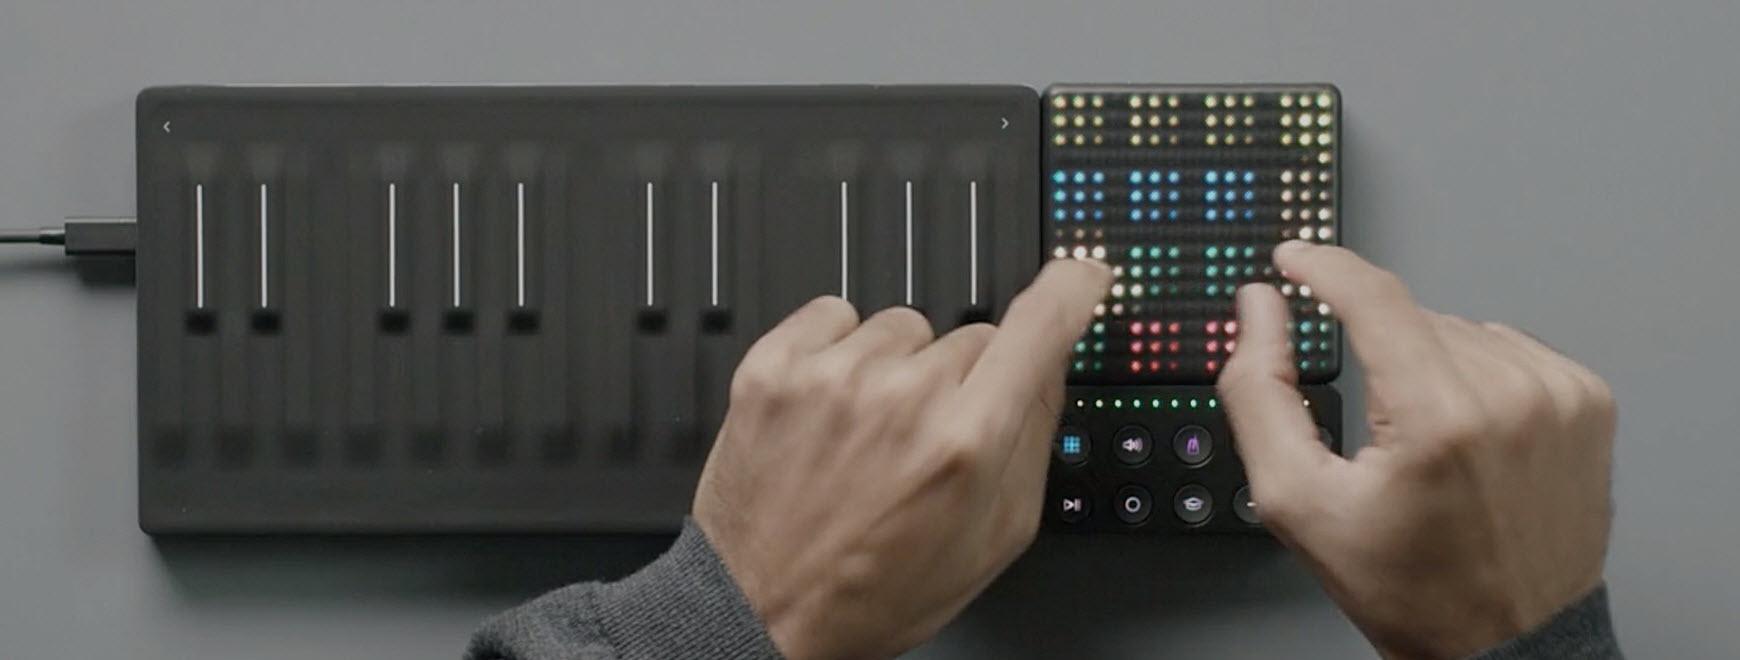 ROLI 发布全球首款与 GarageBand 深度集成的硬件控制器(视频)